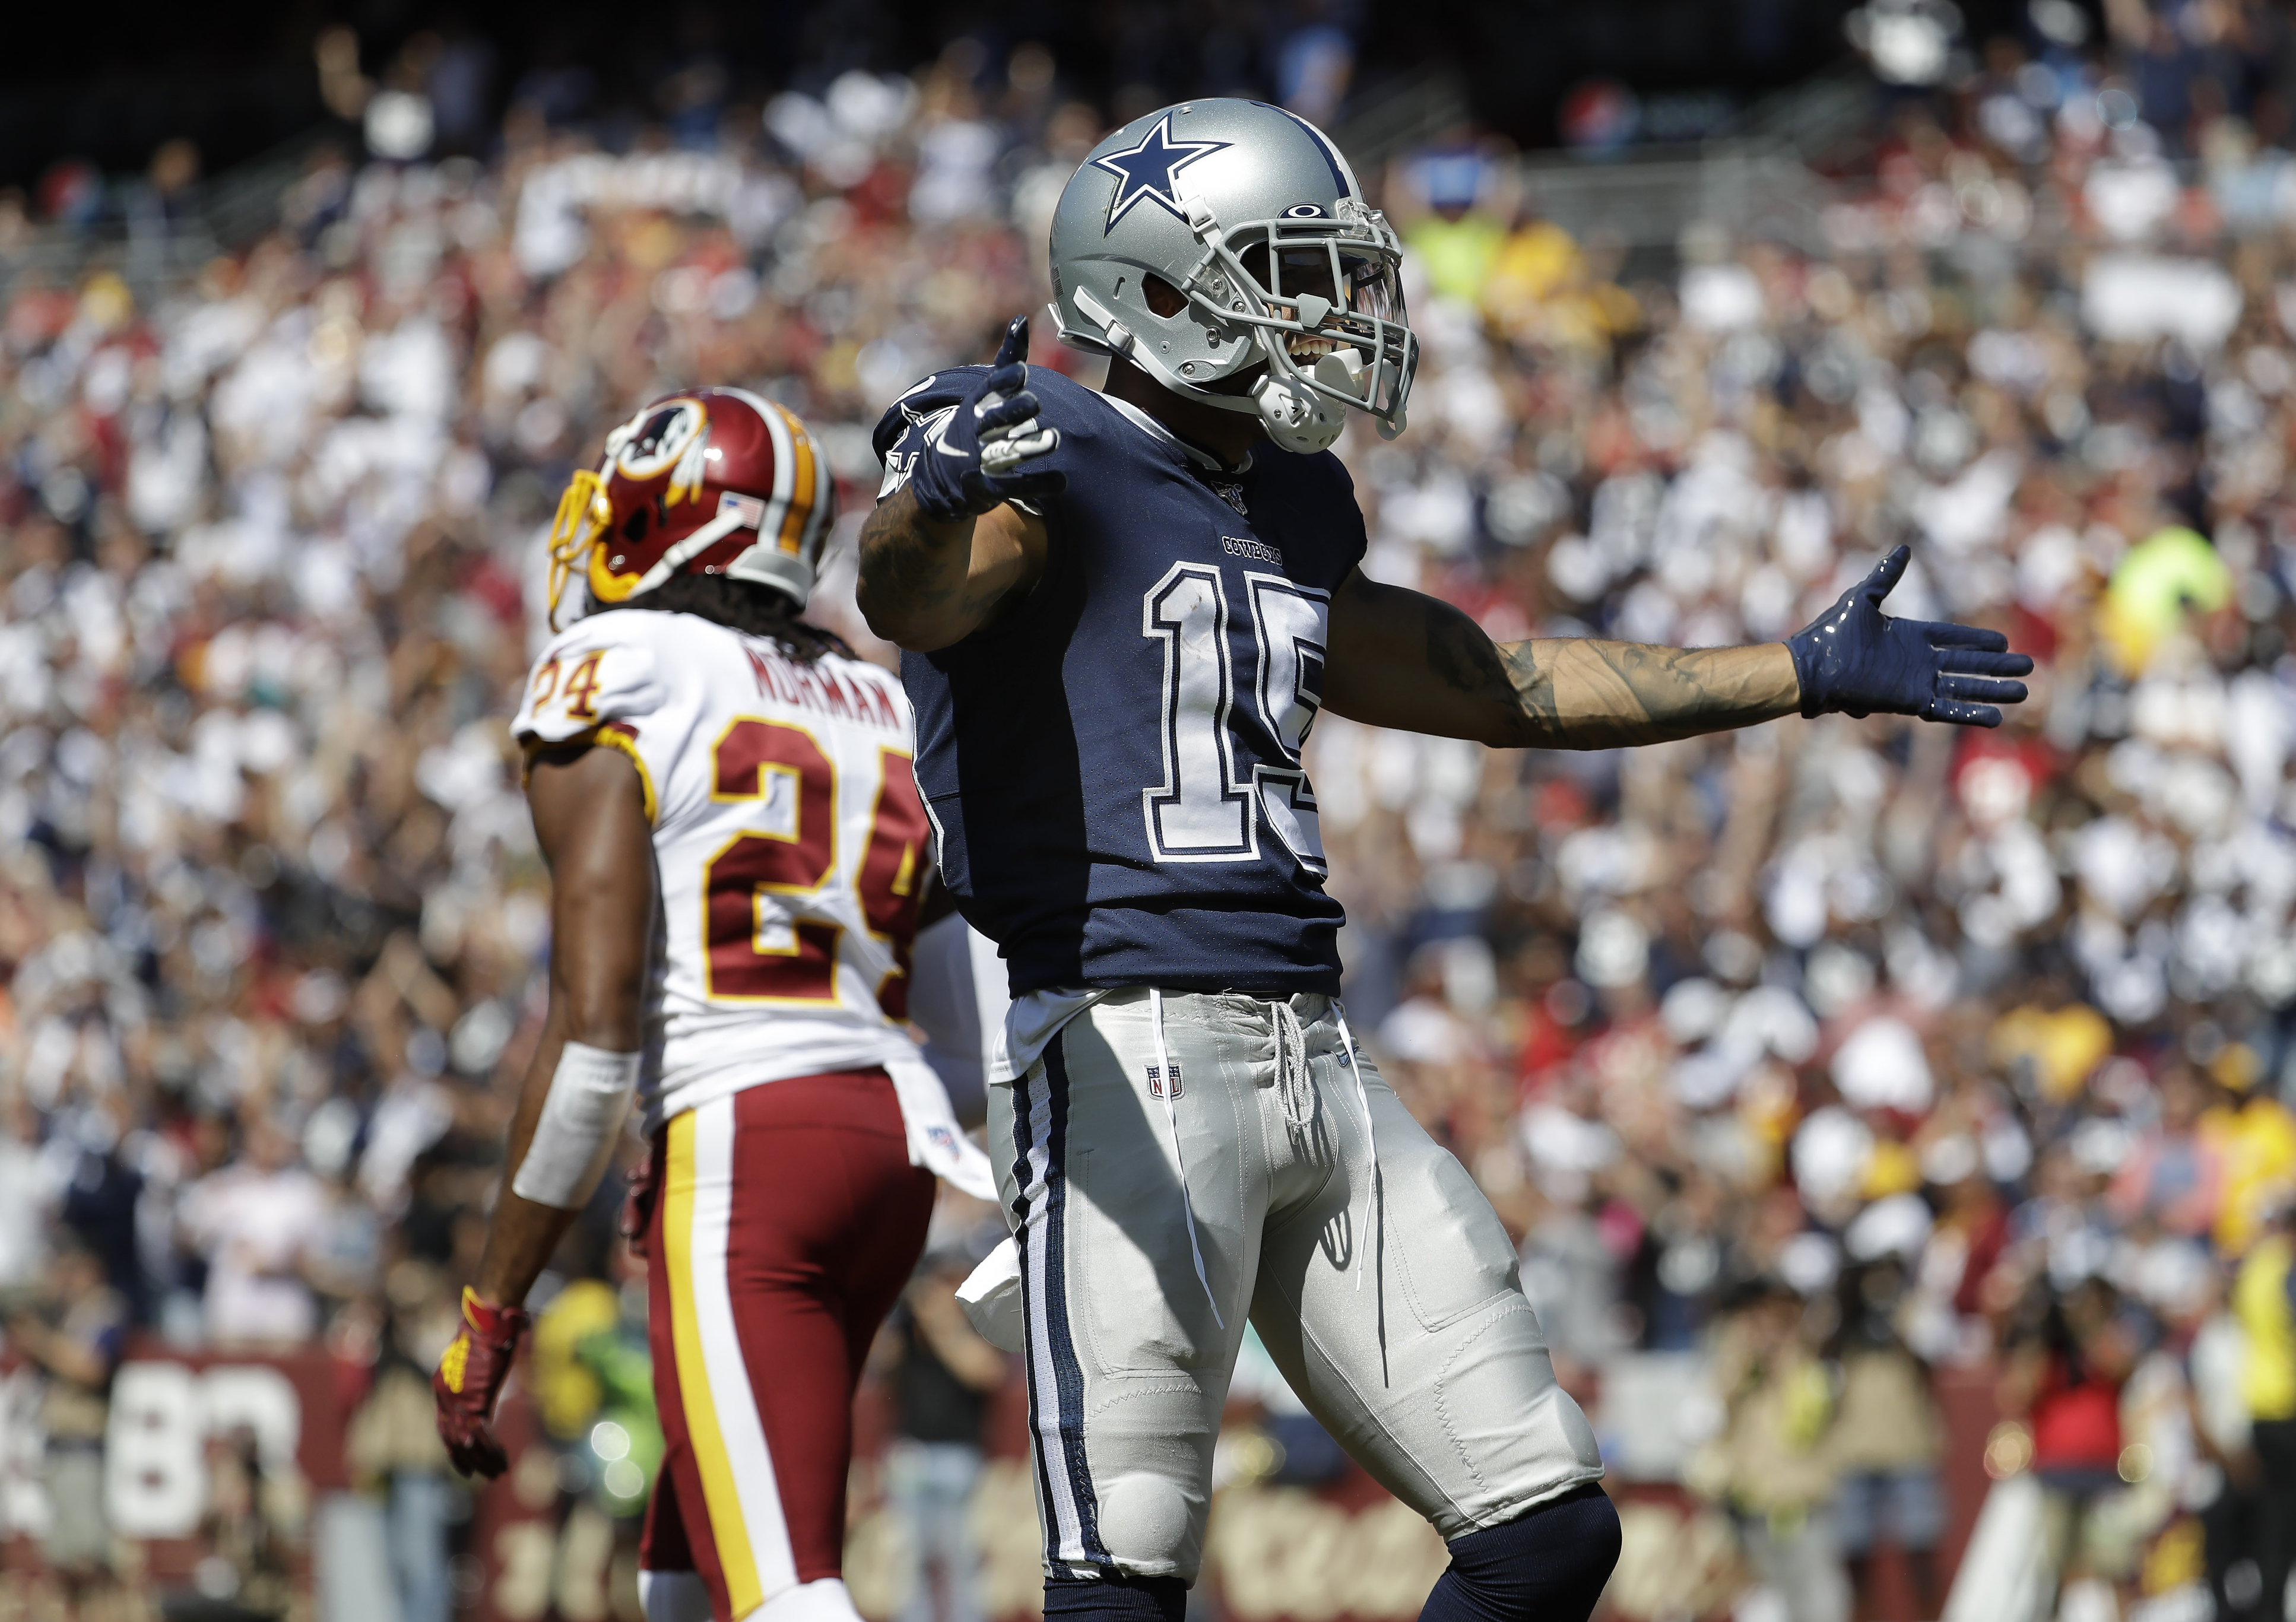 Cowboys lead over Redskins at halftime